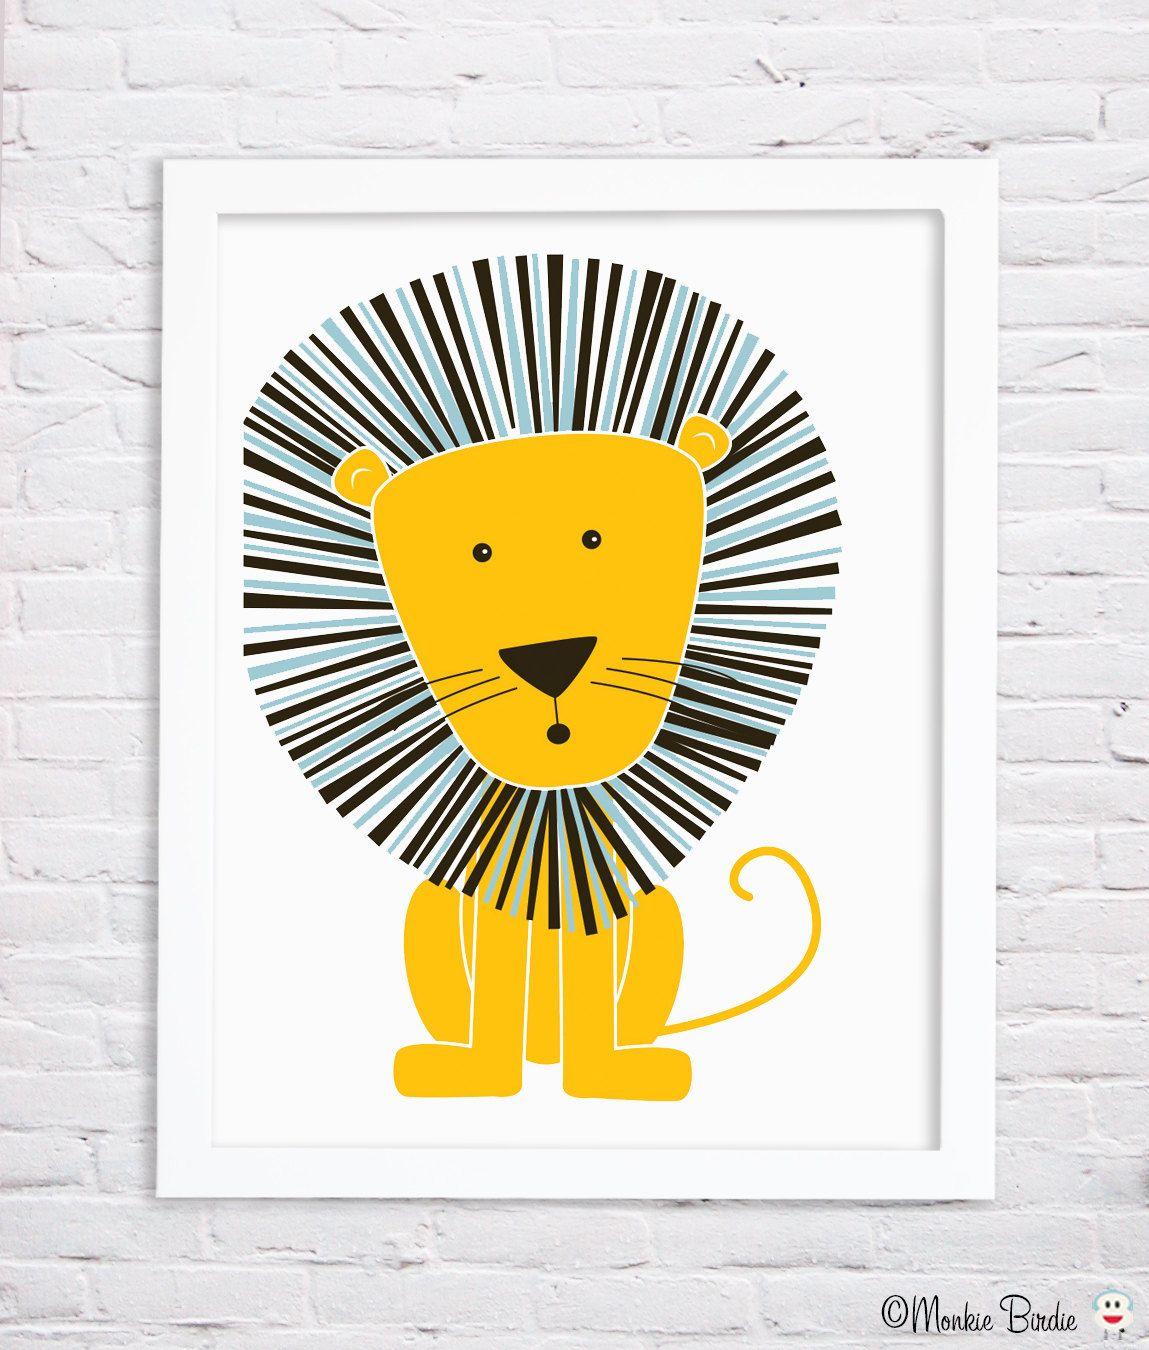 Lion Nursery Art Print by MonkieBirdie on Etsy | Nursery | Pinterest ...